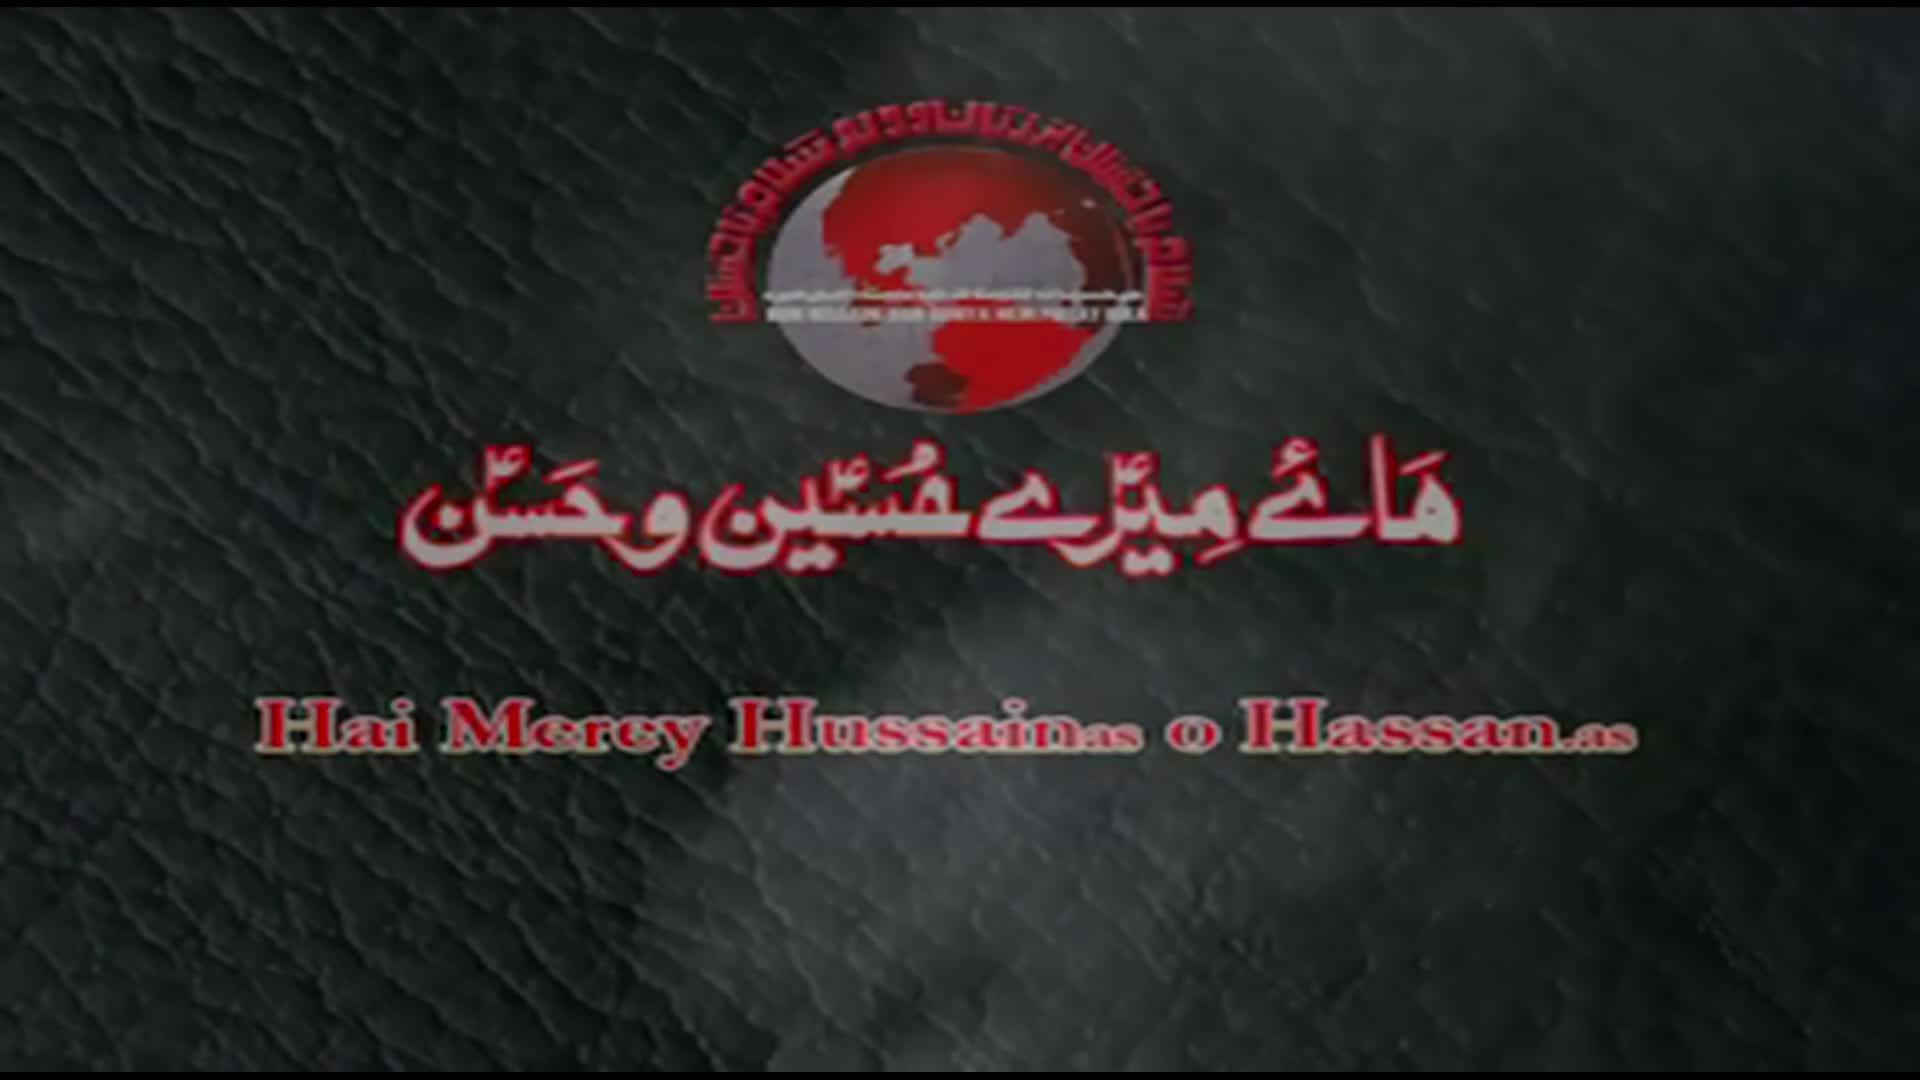 Haye Mere Hussain o Hassan